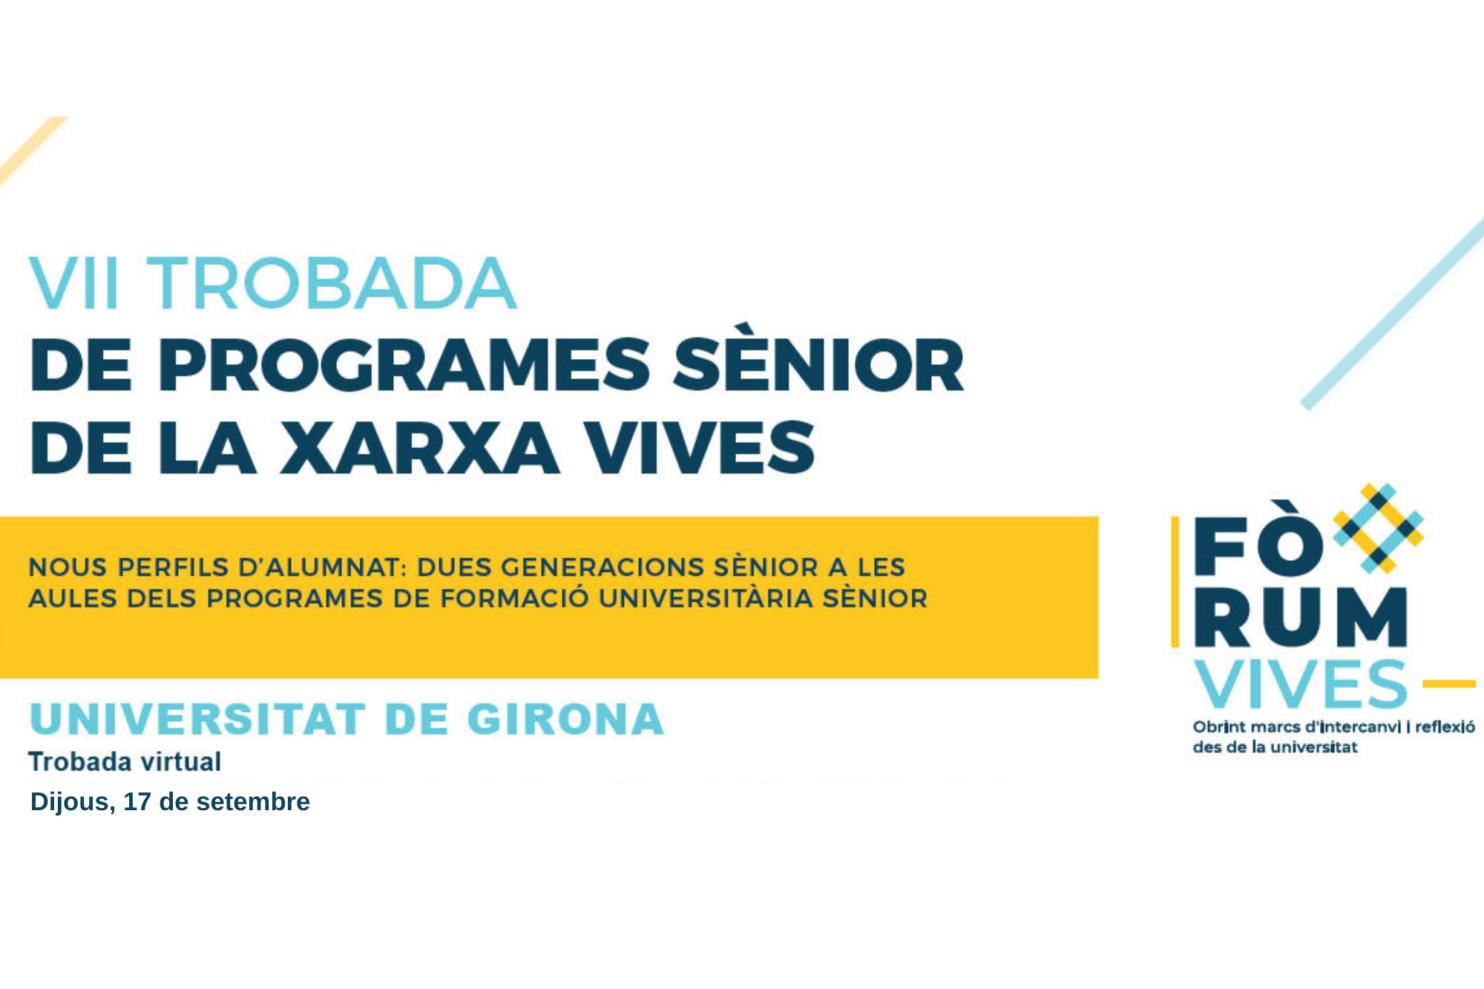 VII Trobada de Programes Sènior de la Xara Vives. NdP